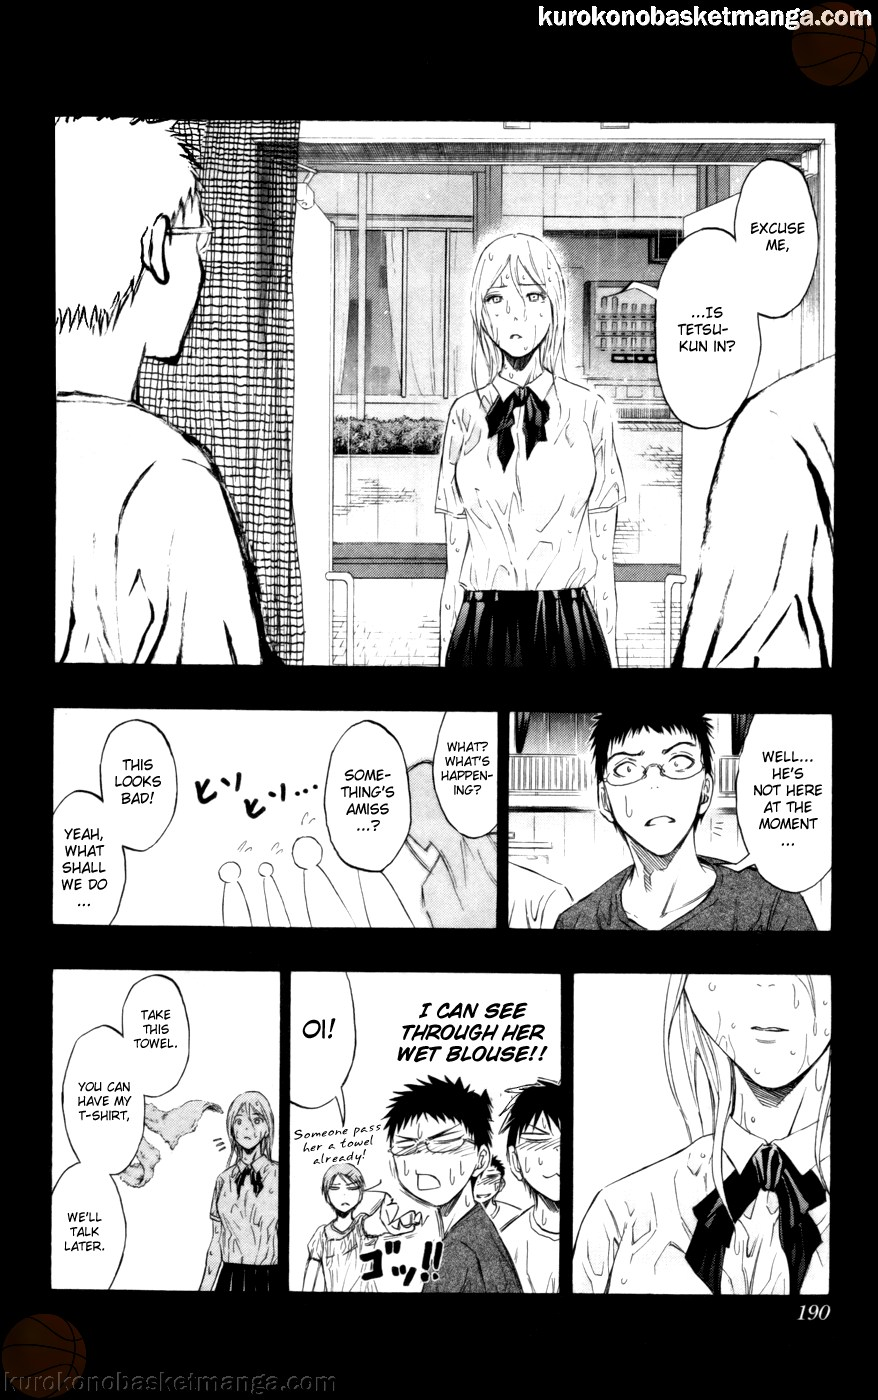 Kuroko no Basket Manga Chapter 80 - Image 04